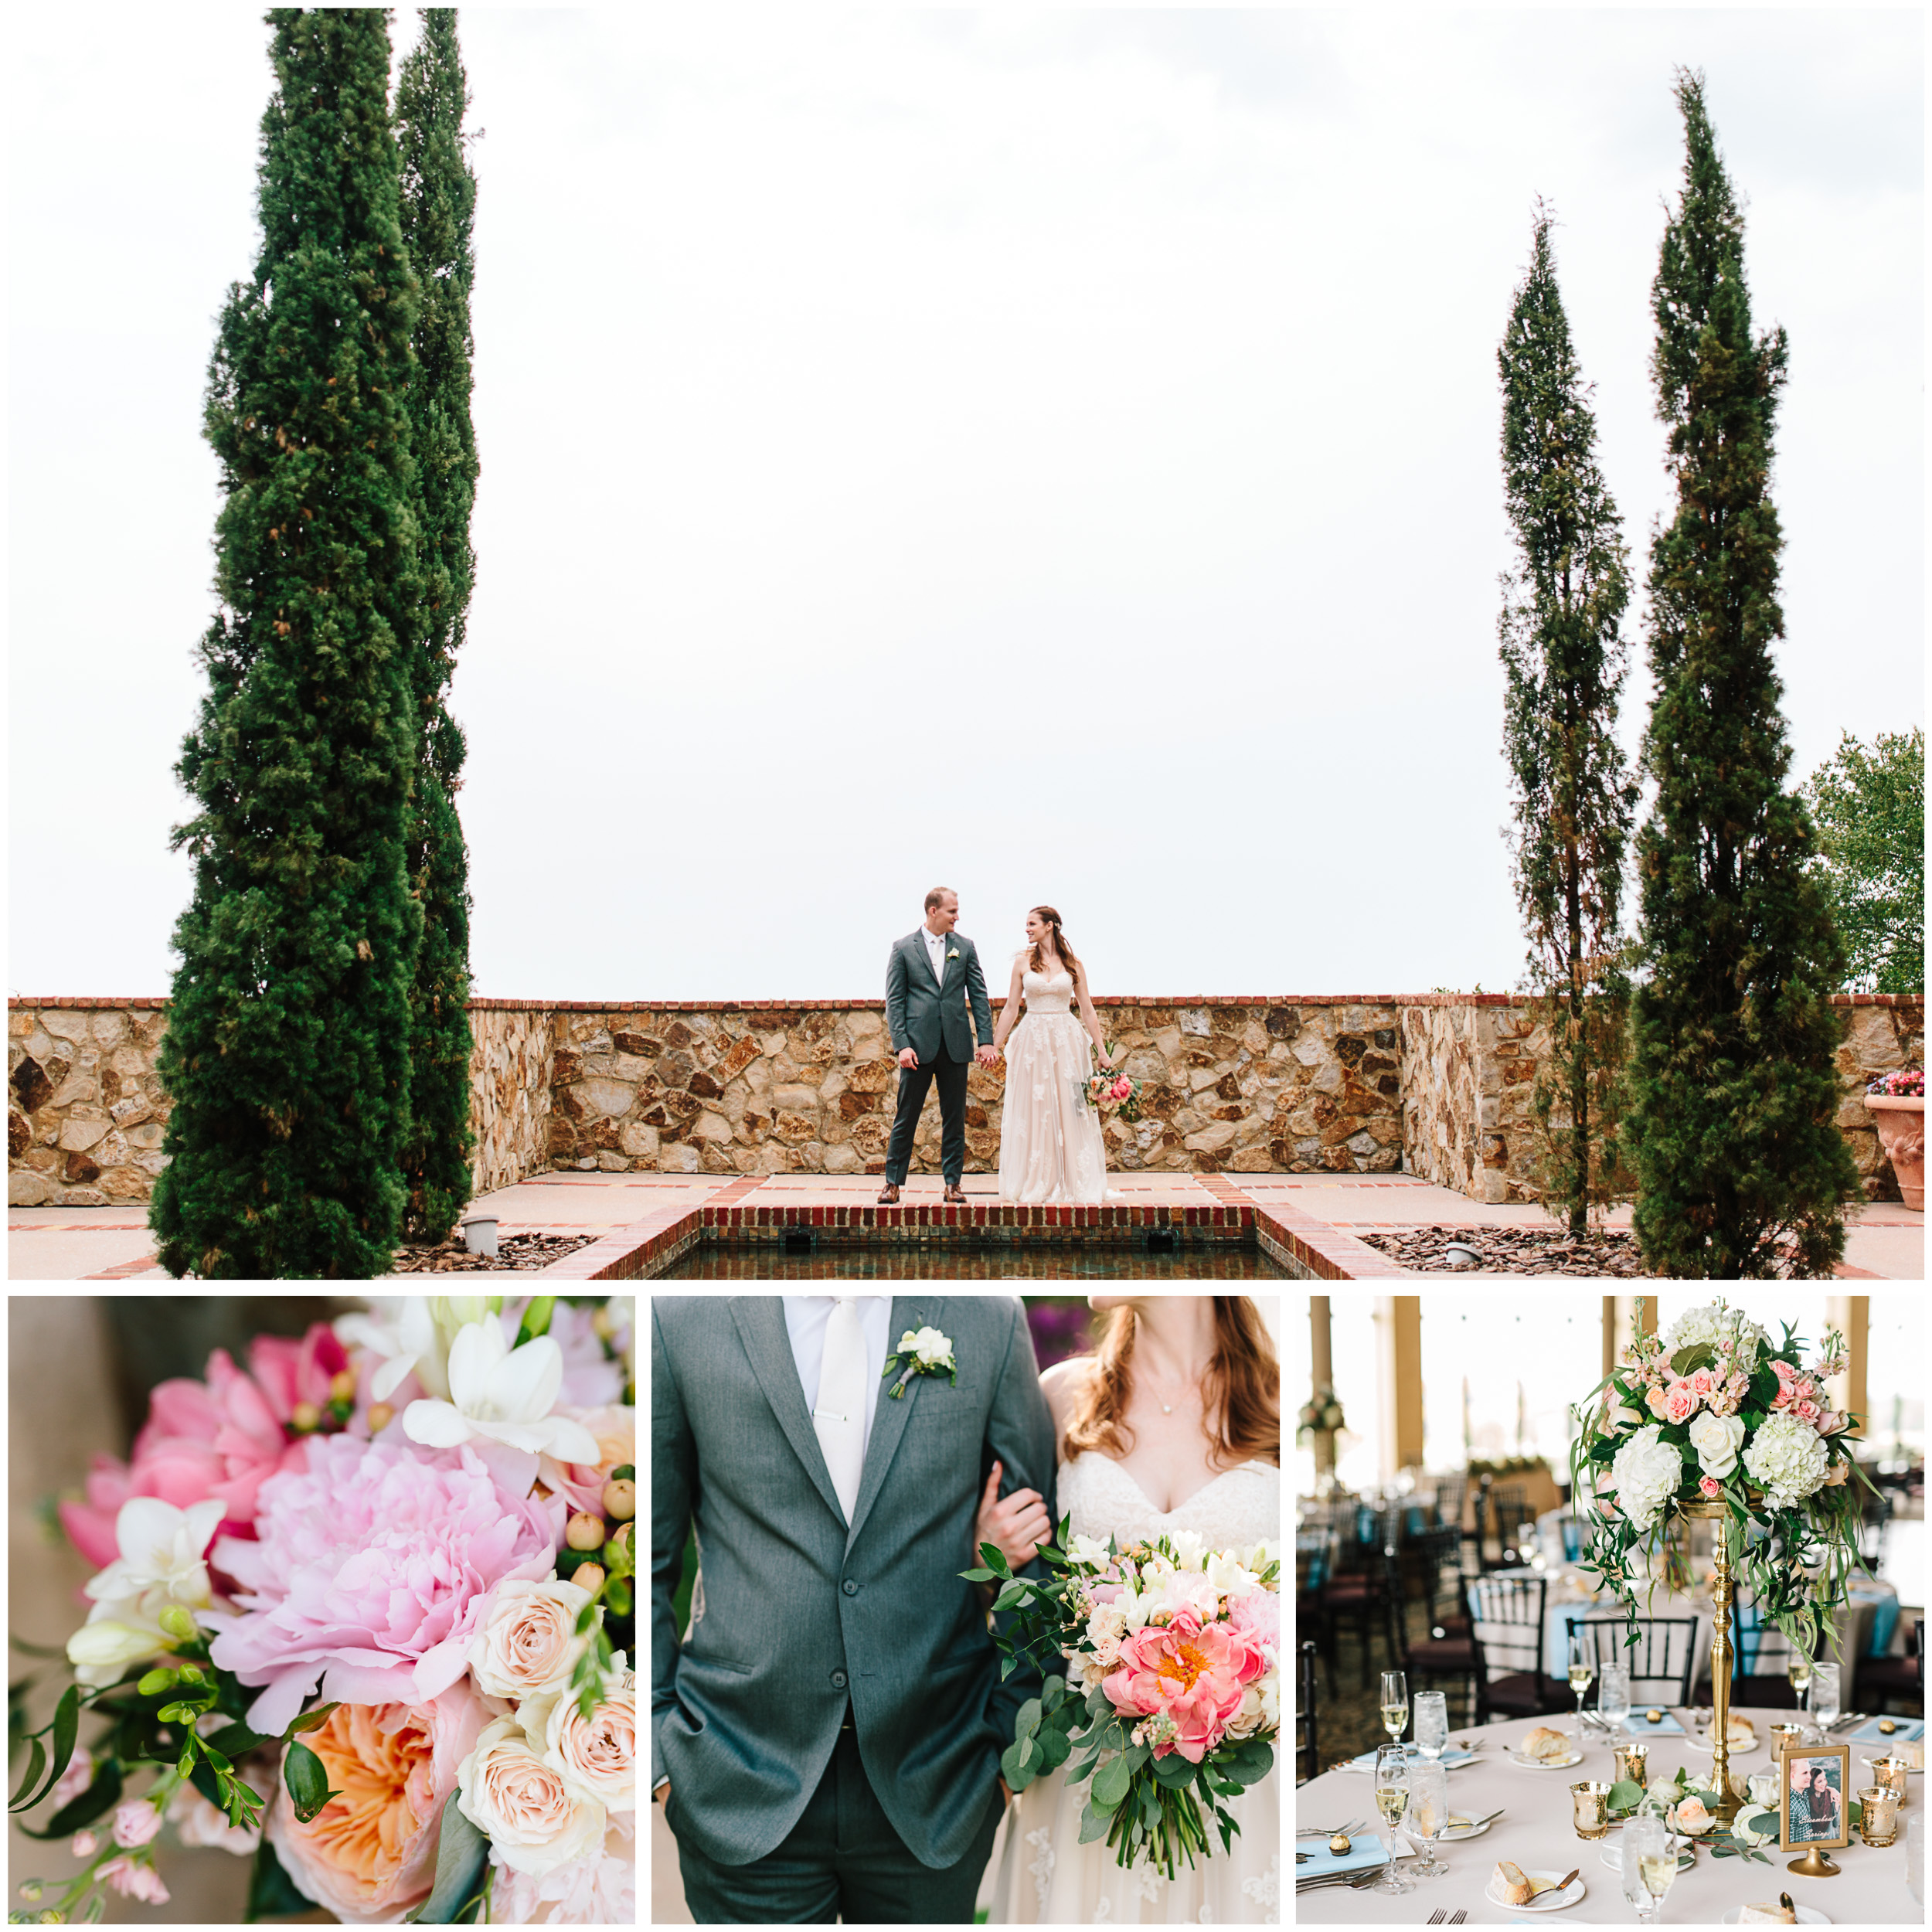 bella_collina_wedding_header.jpg